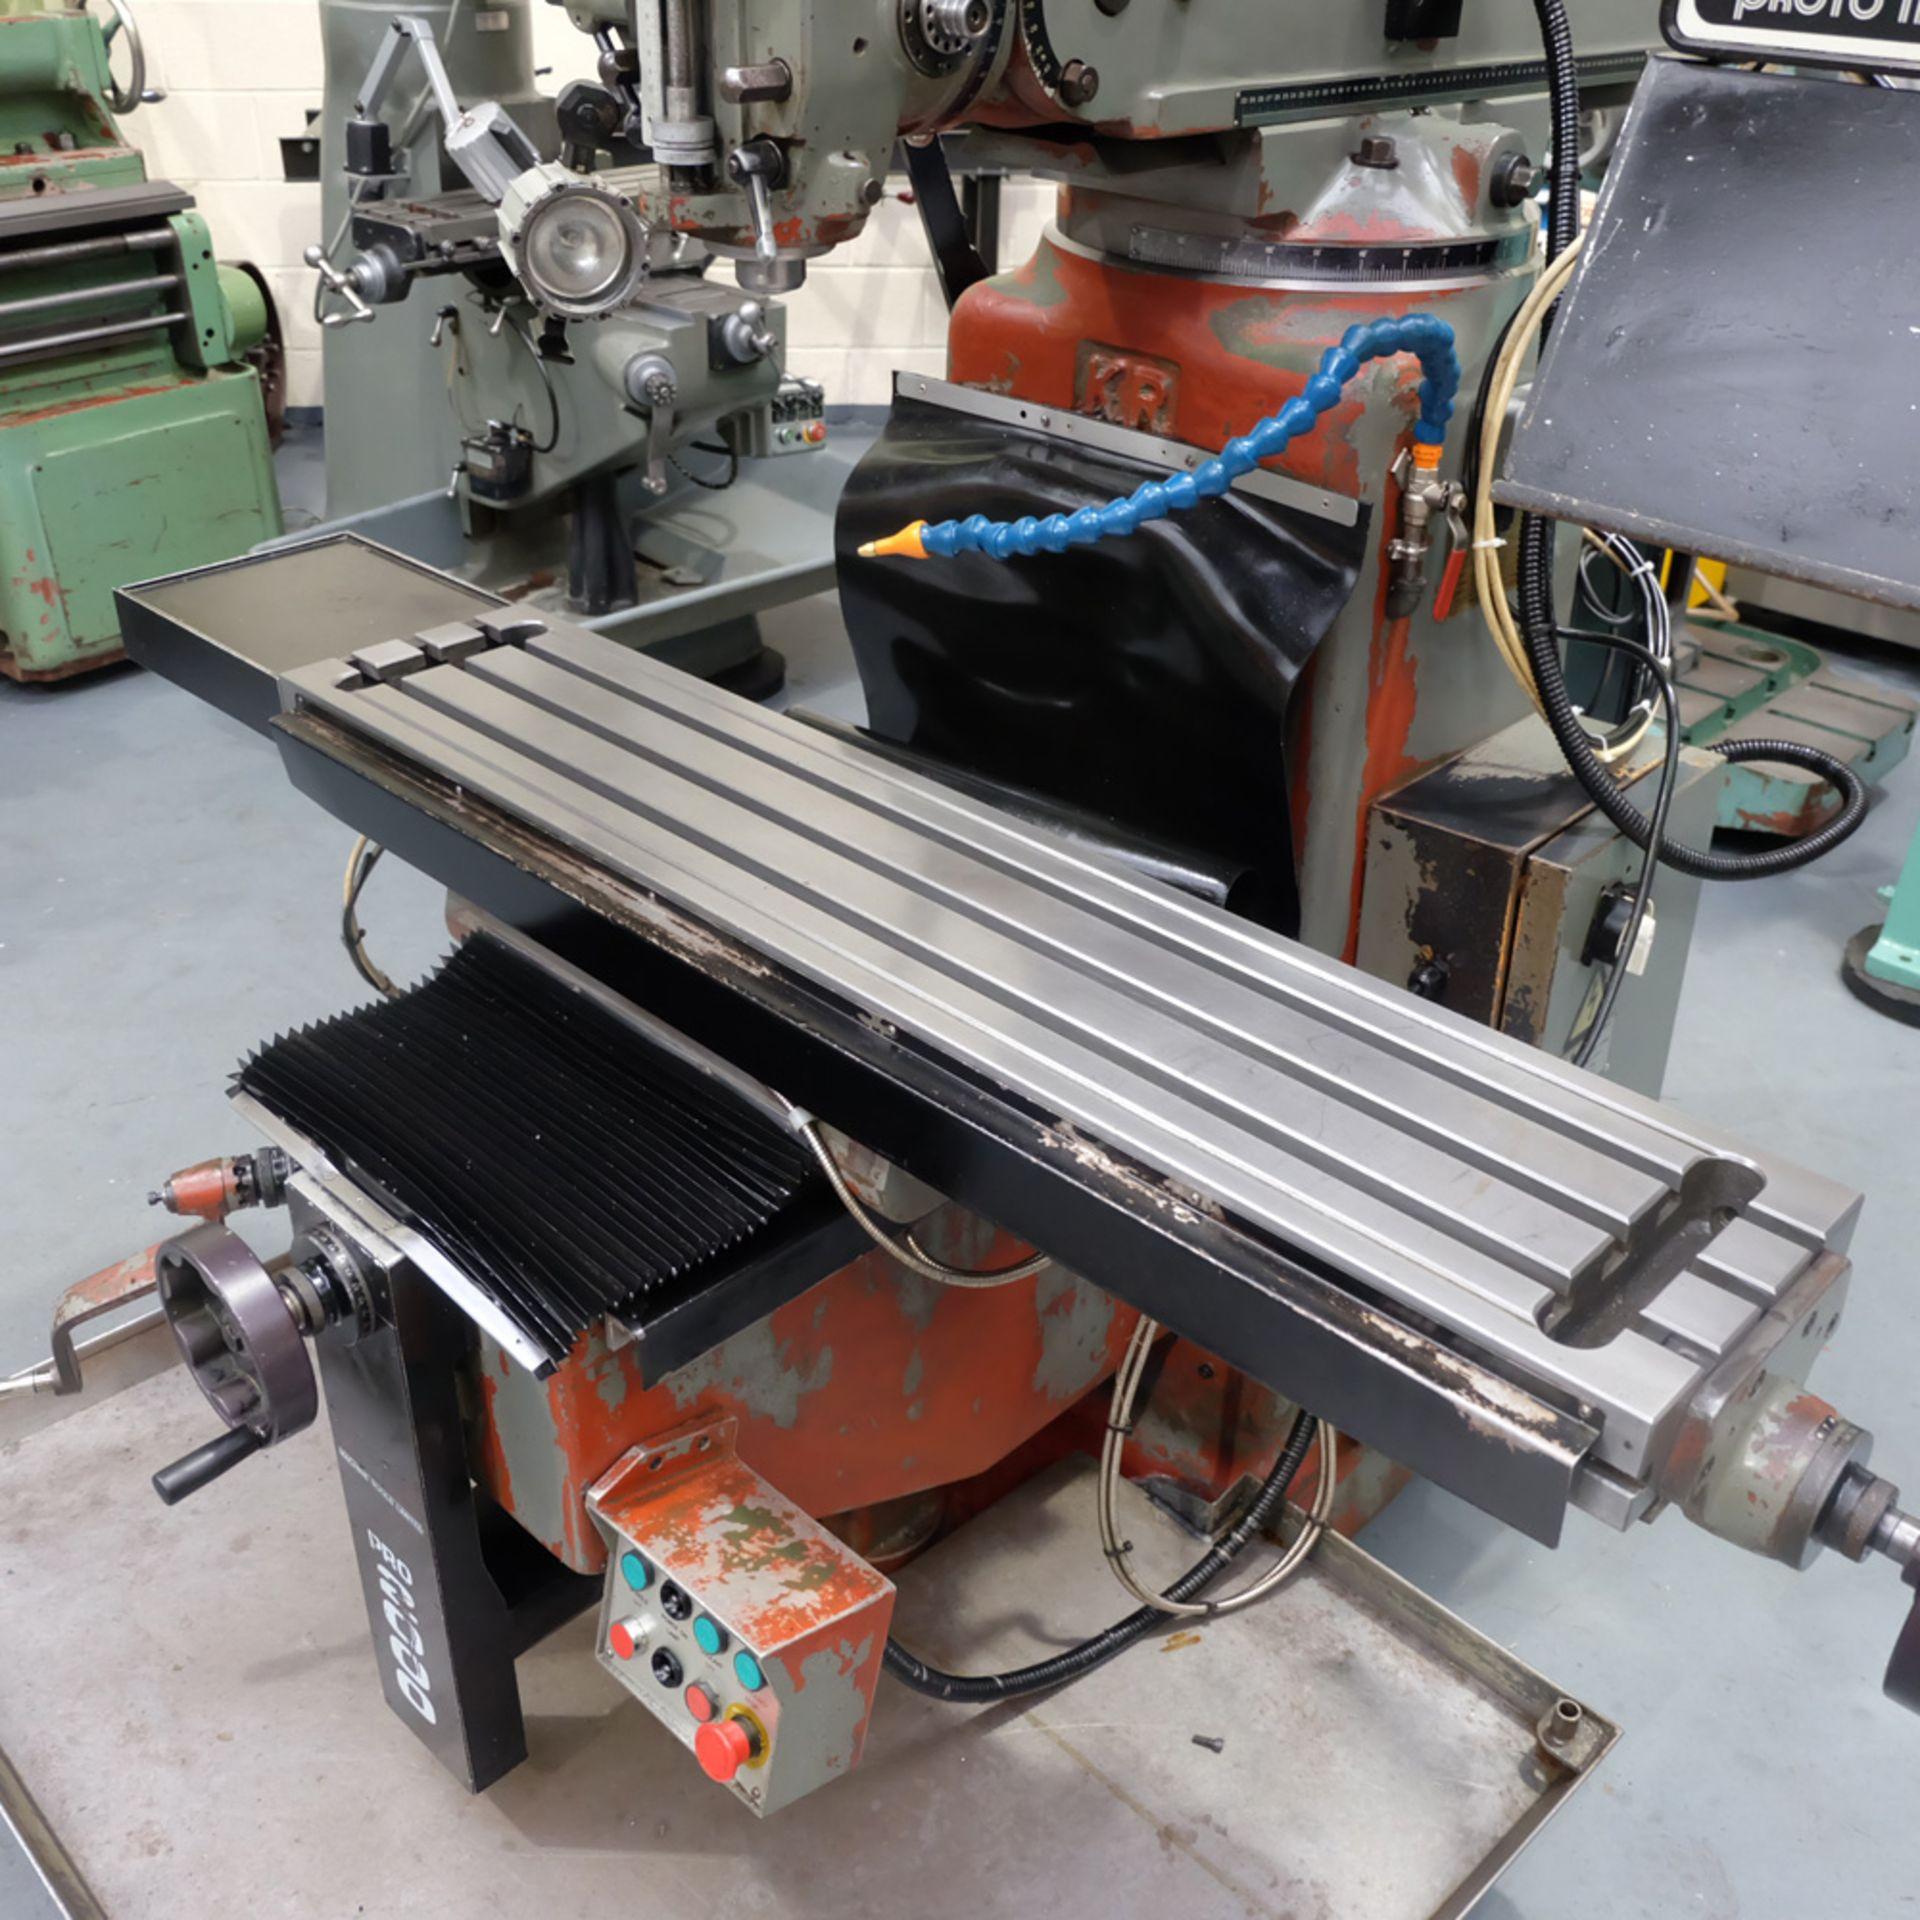 KRV Pro 2000: Turret Milling Machine. - Image 5 of 11